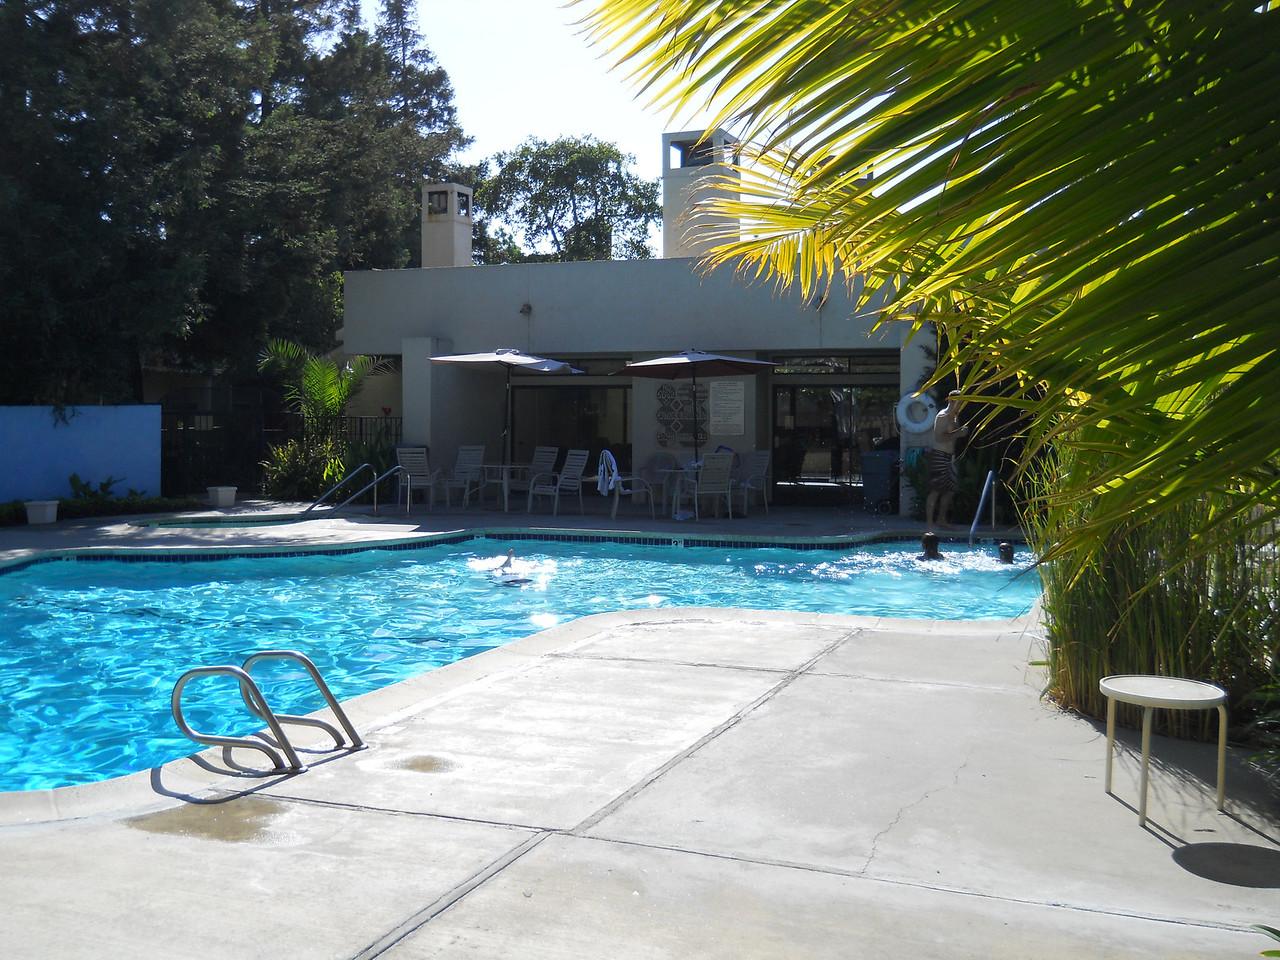 California Trip for Mike & Leonie's church wedding.  The pool at their condo